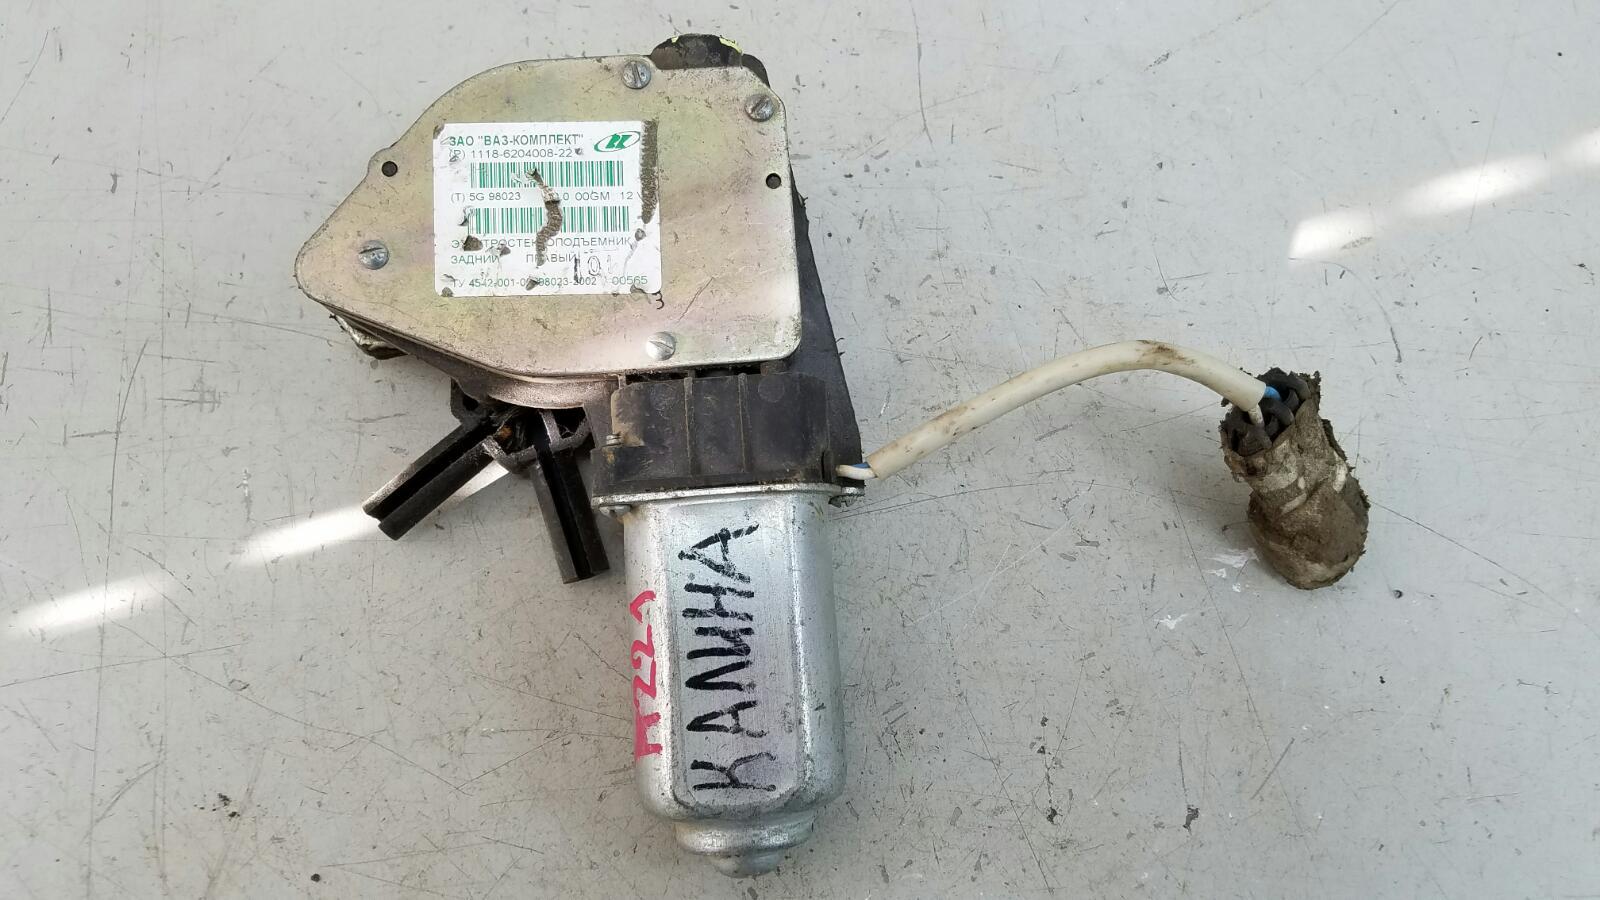 Моторчик стеклоподъемника Ваз Лада Калина 1118 1.4Л 16КЛАПАНОВ 2004